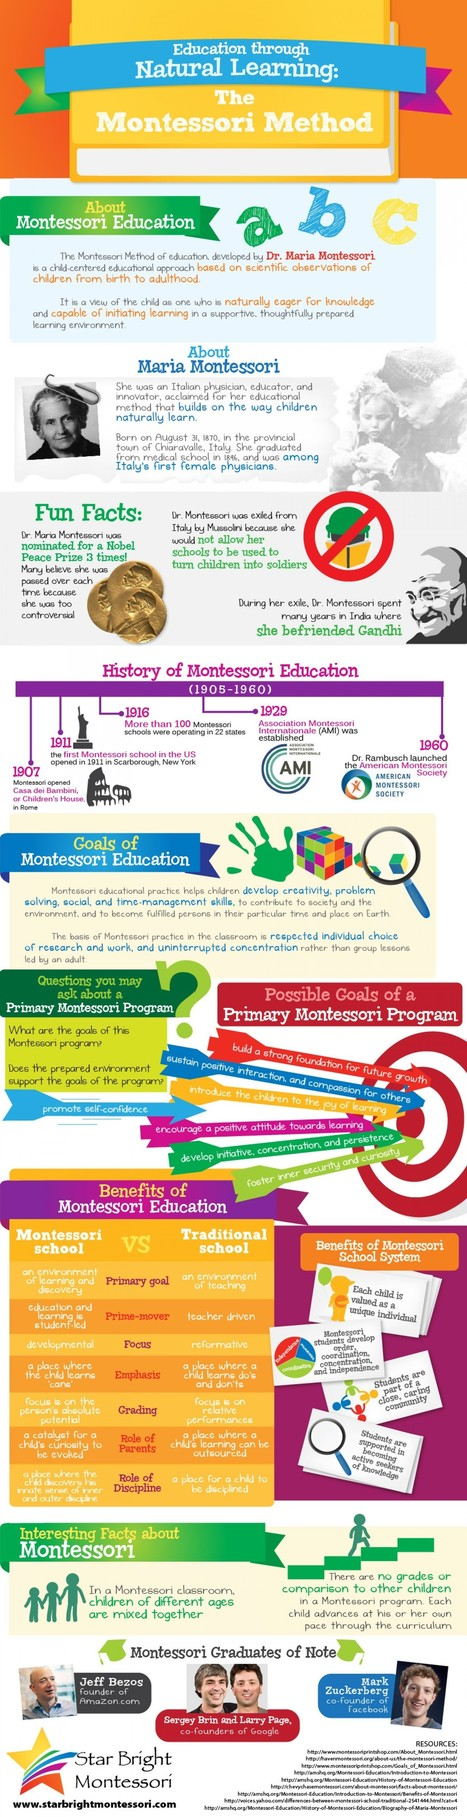 Education Through Natural Learning (Montessori) Infographic | Montessori education | Scoop.it